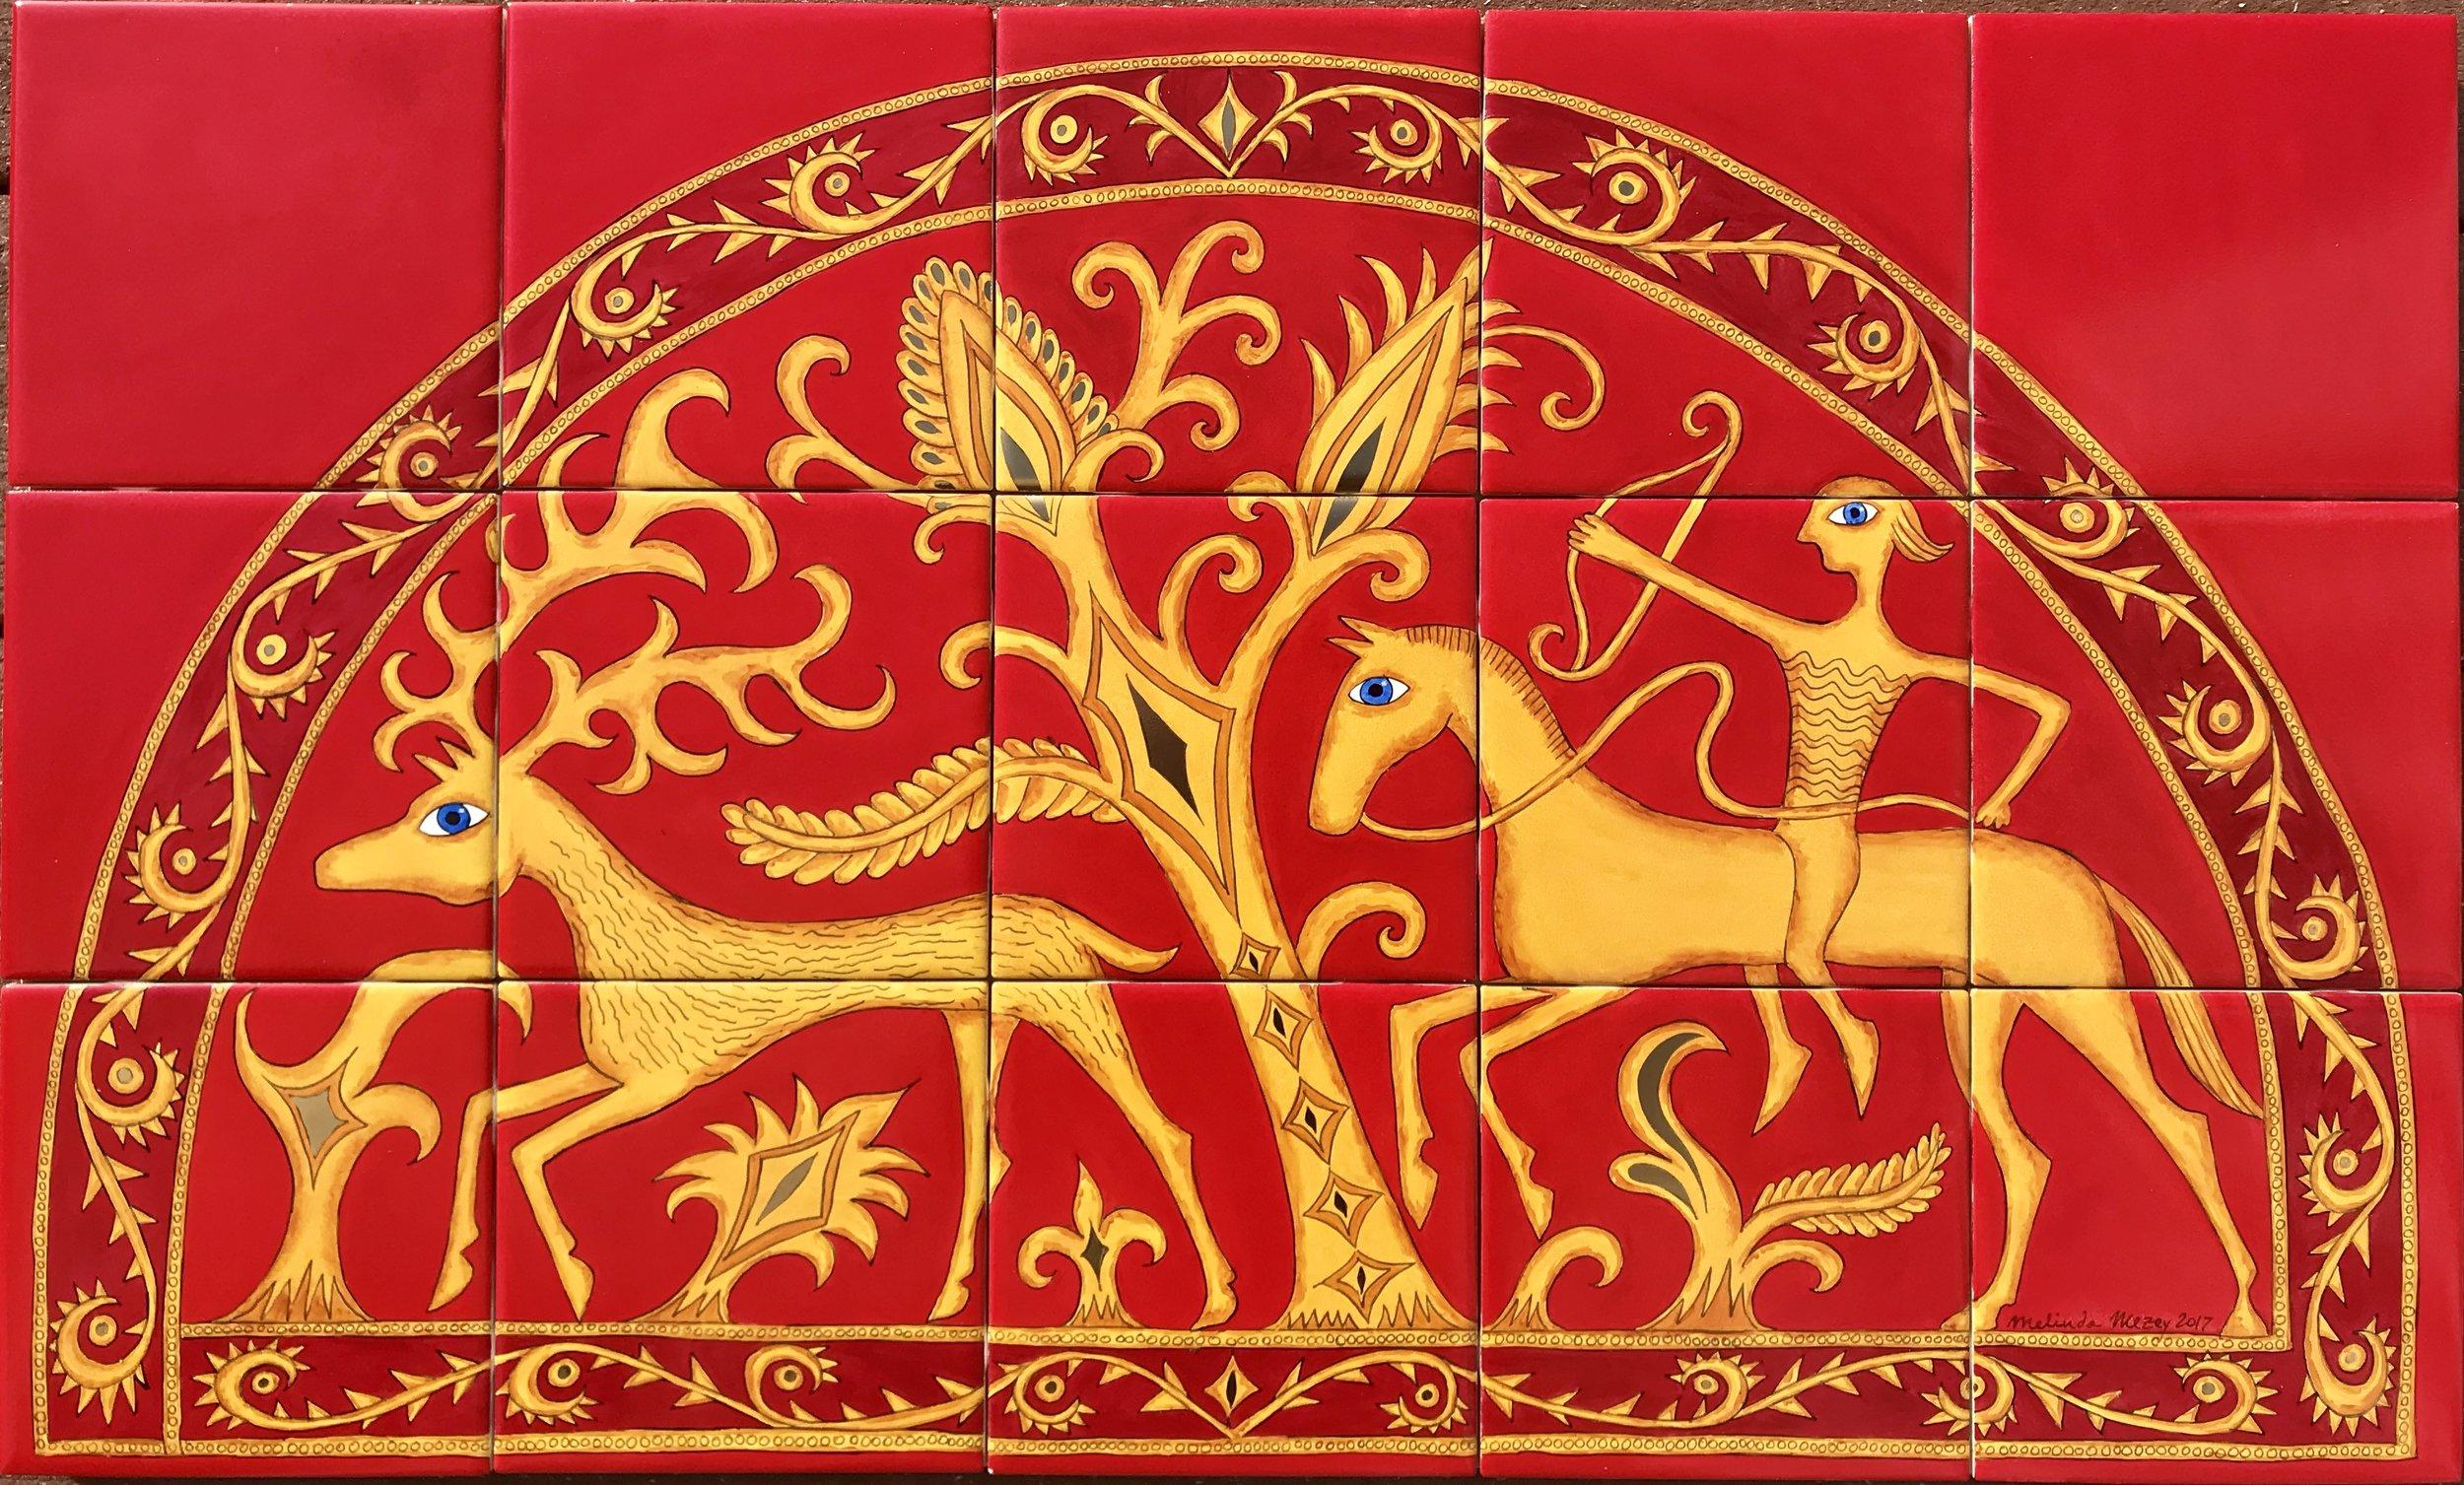 Golden Stag & Hunter -  18 x 30 in, 46 x 76 cm